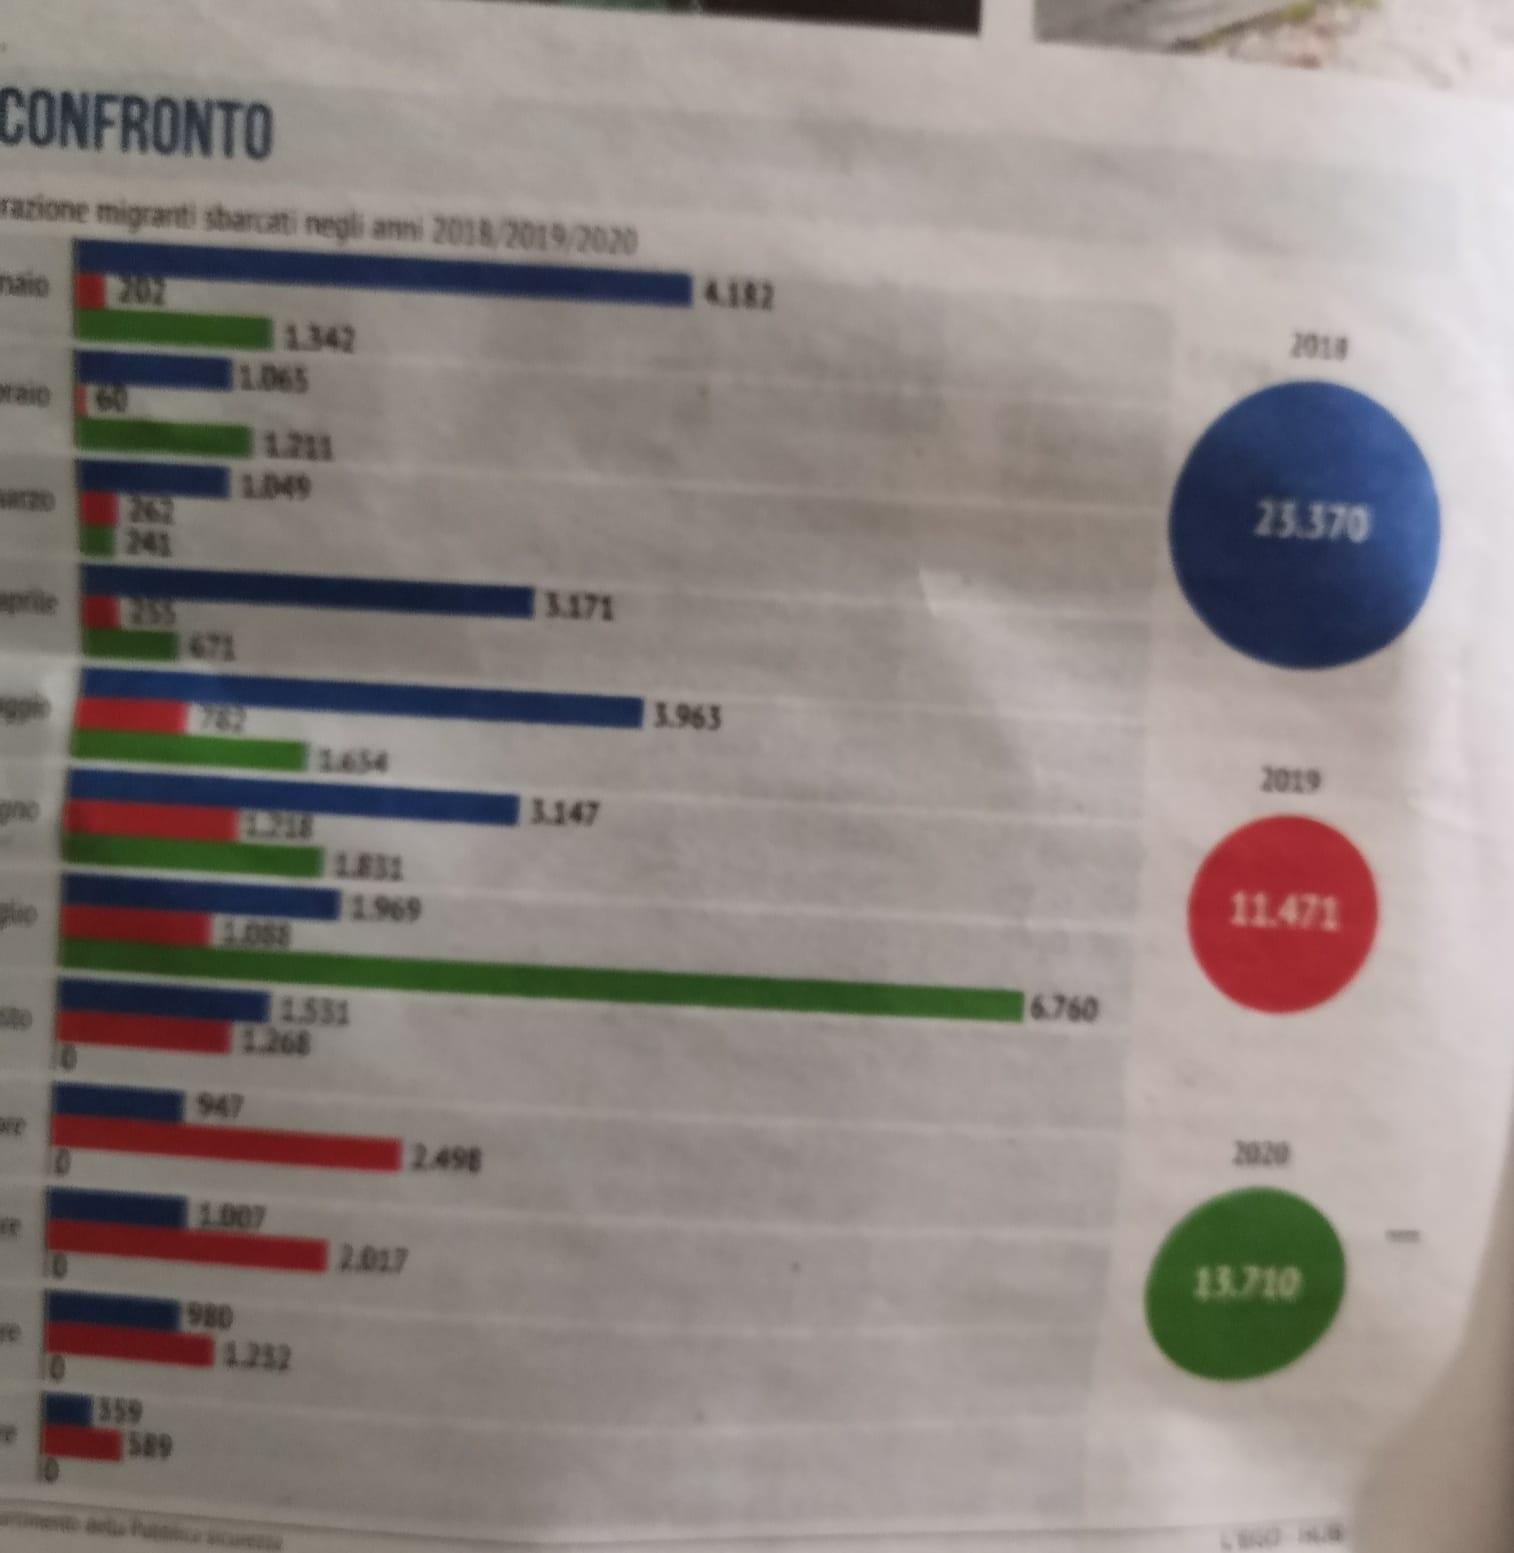 italienische Zeitung